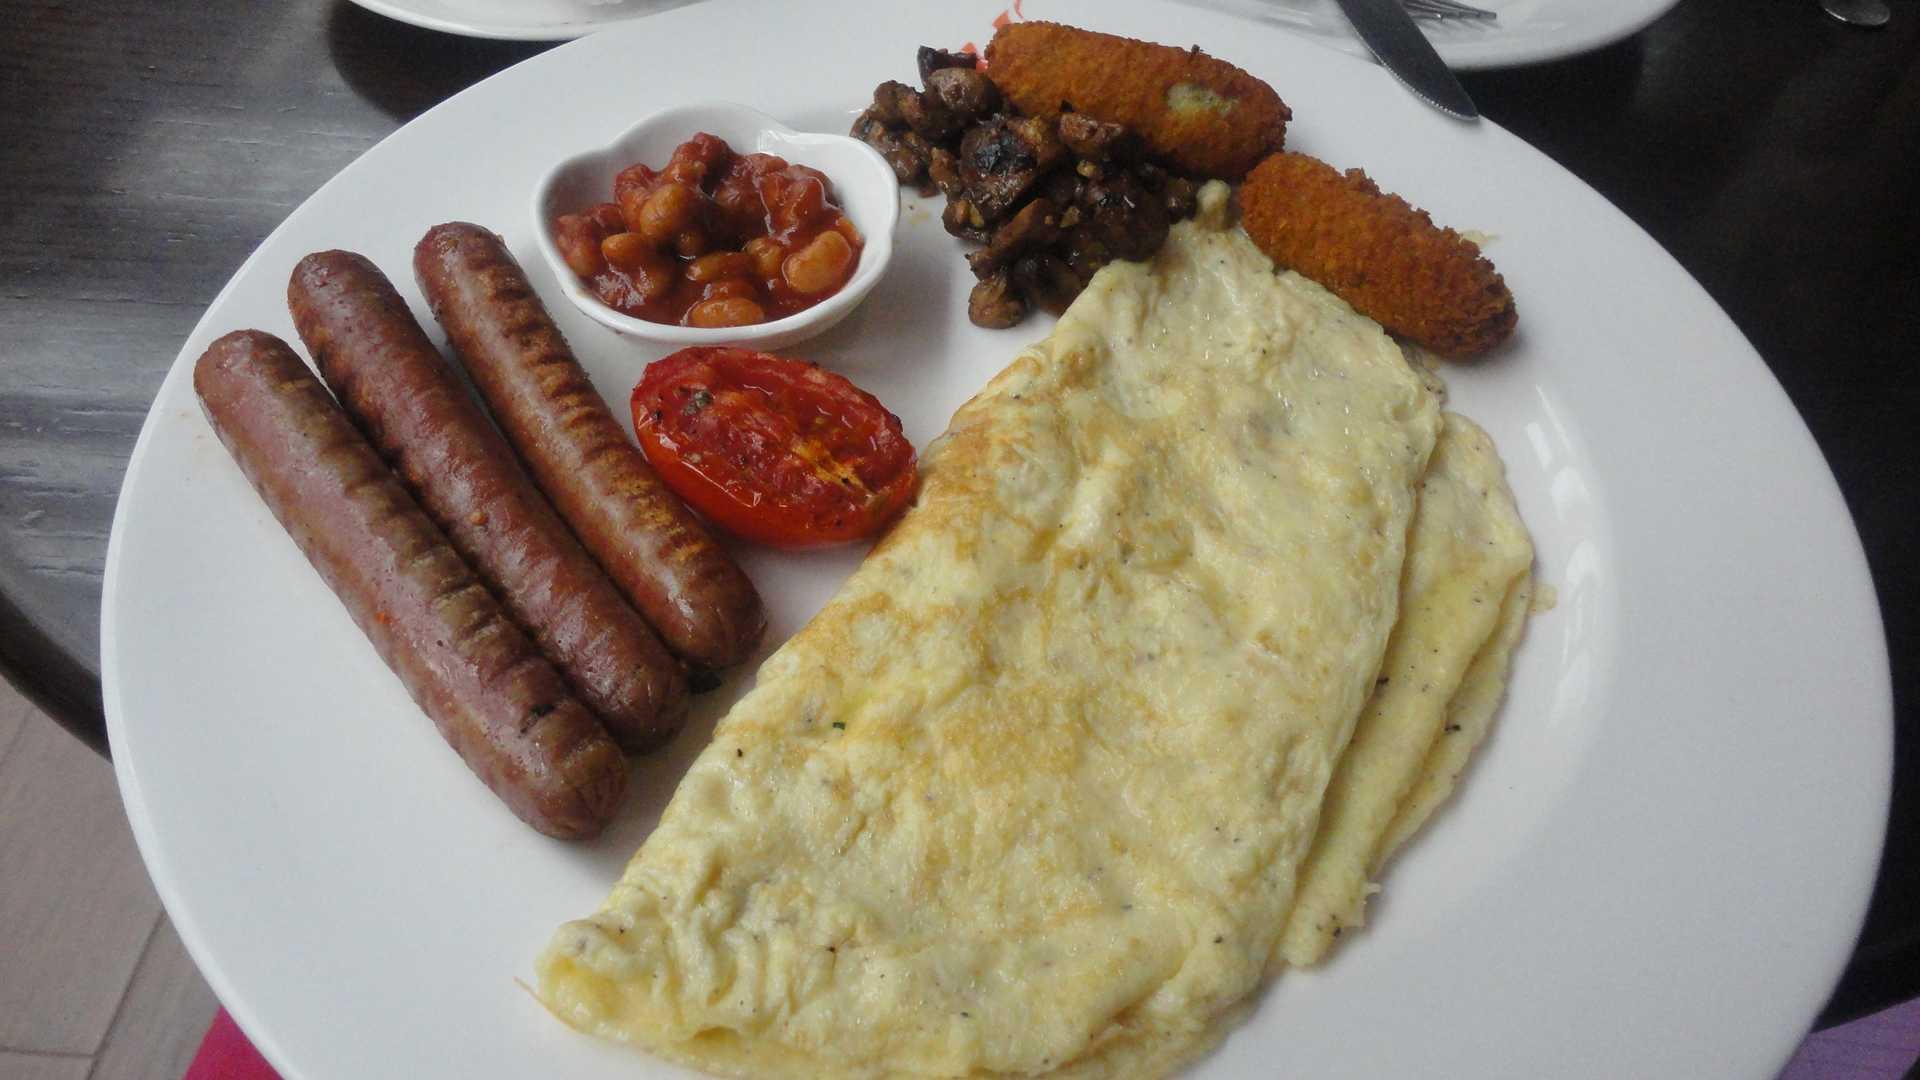 Breakfast at Pecos-fnbworld